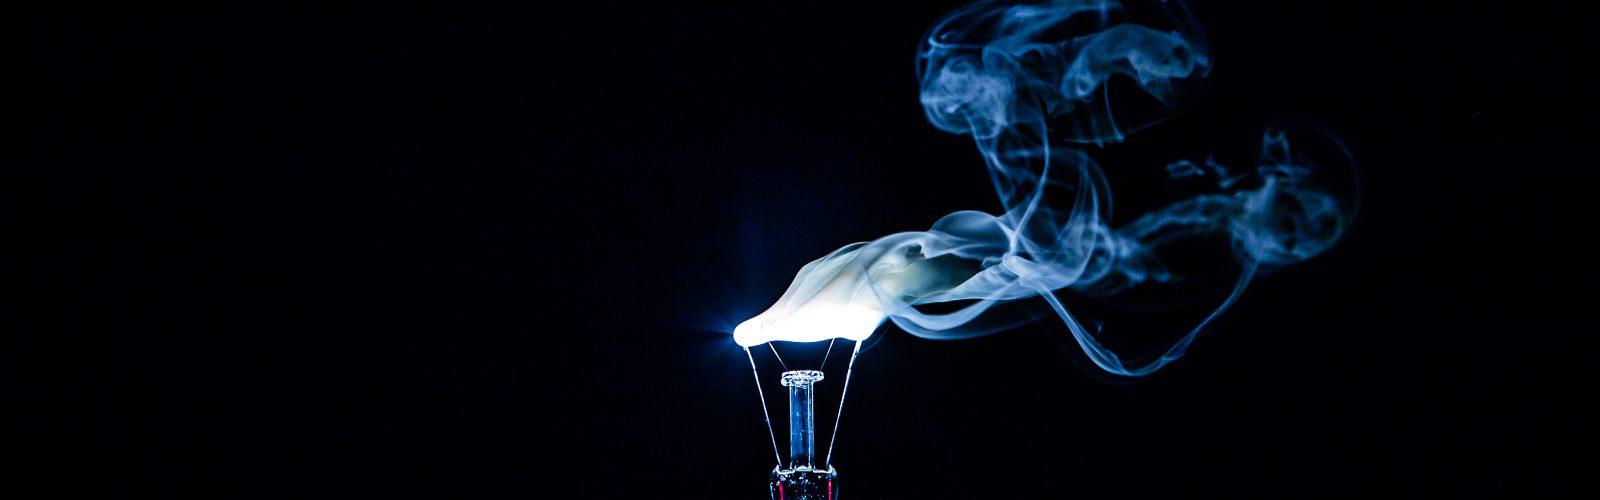 Blauer Glühfaden | Norbert Eder Photography